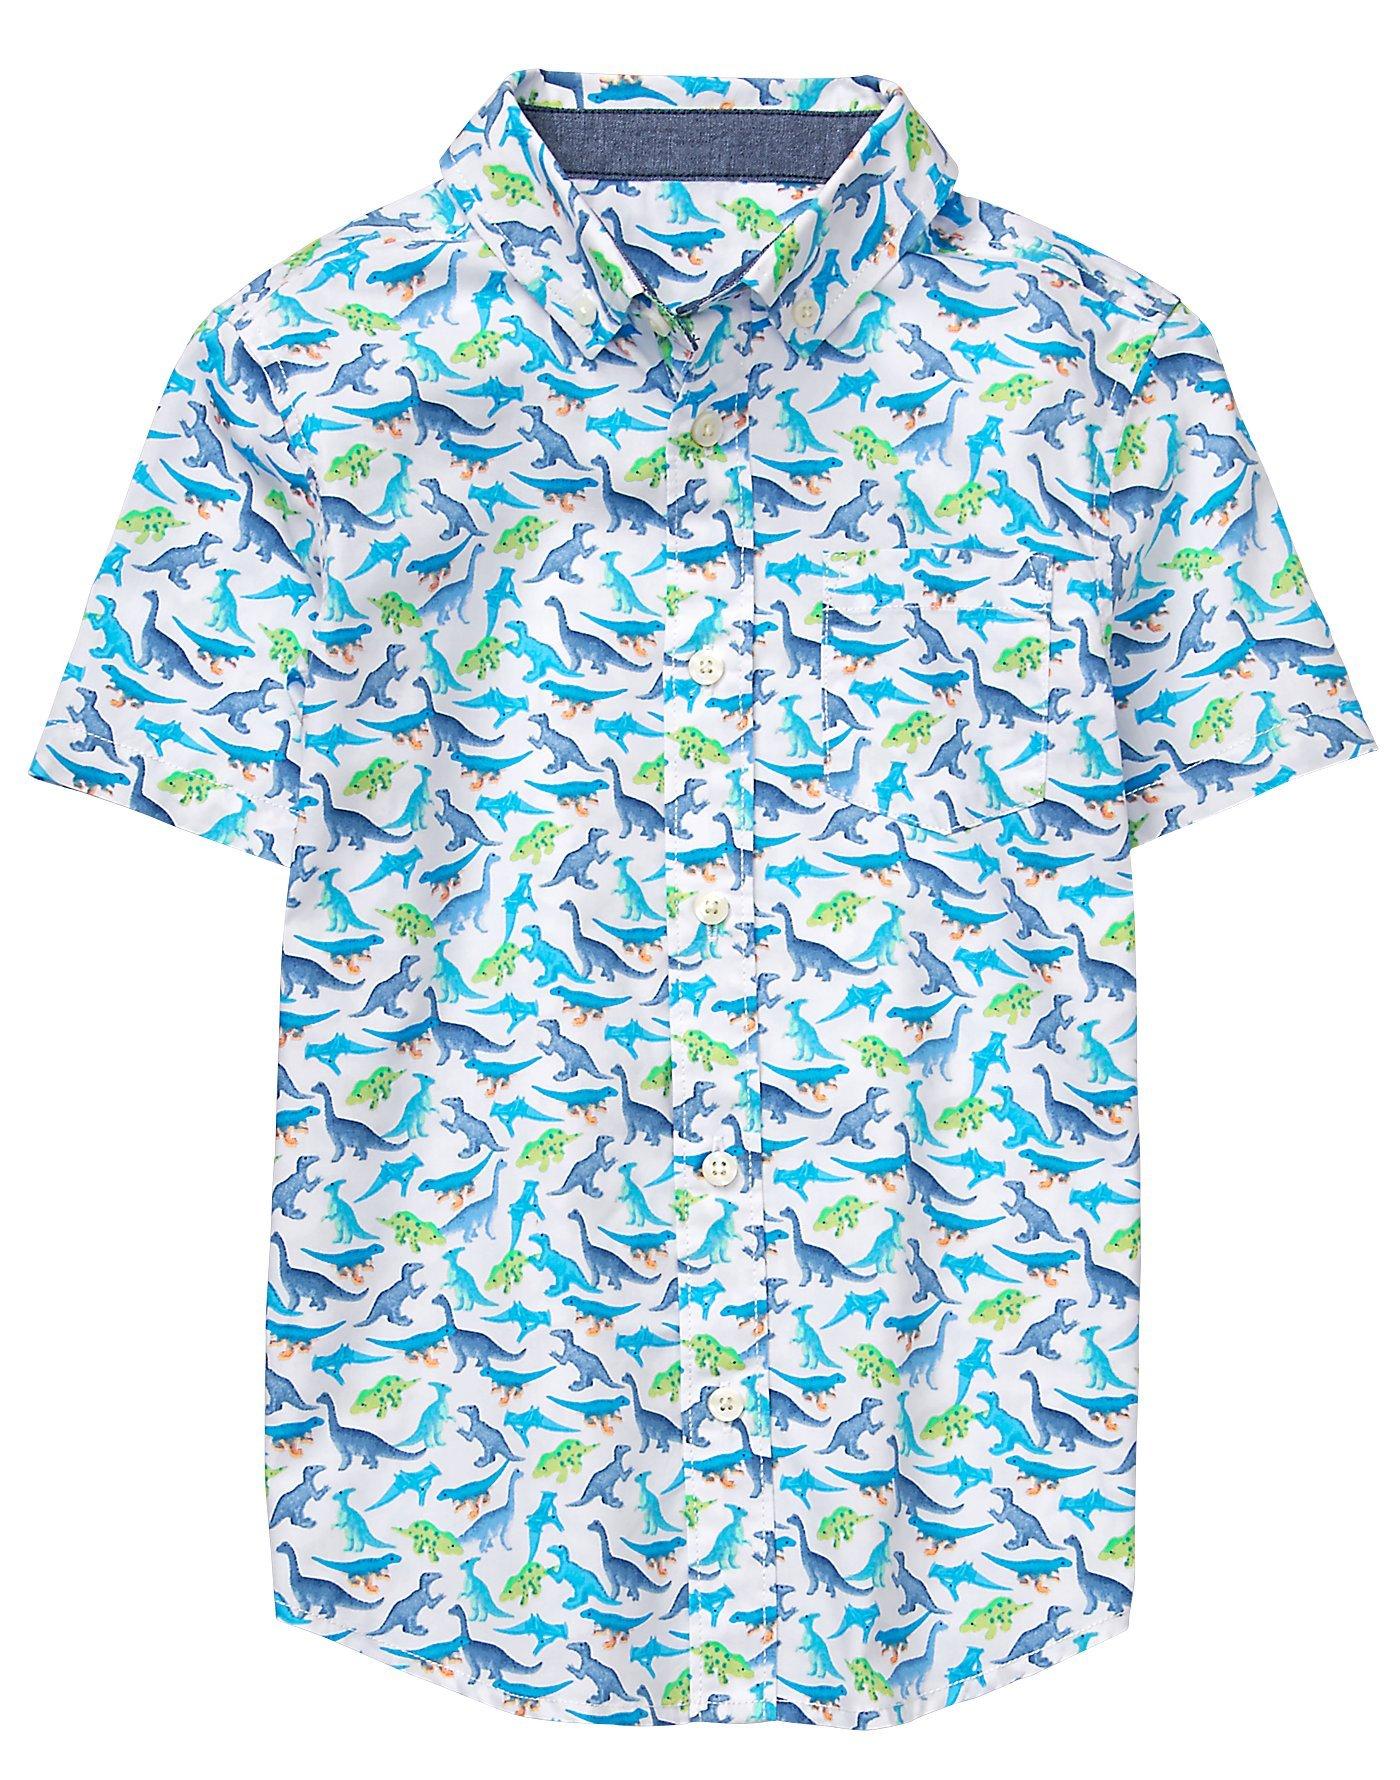 Gymboree Little Boys' Short Sleeve Button up Shirt, Laser Blue Dino, S